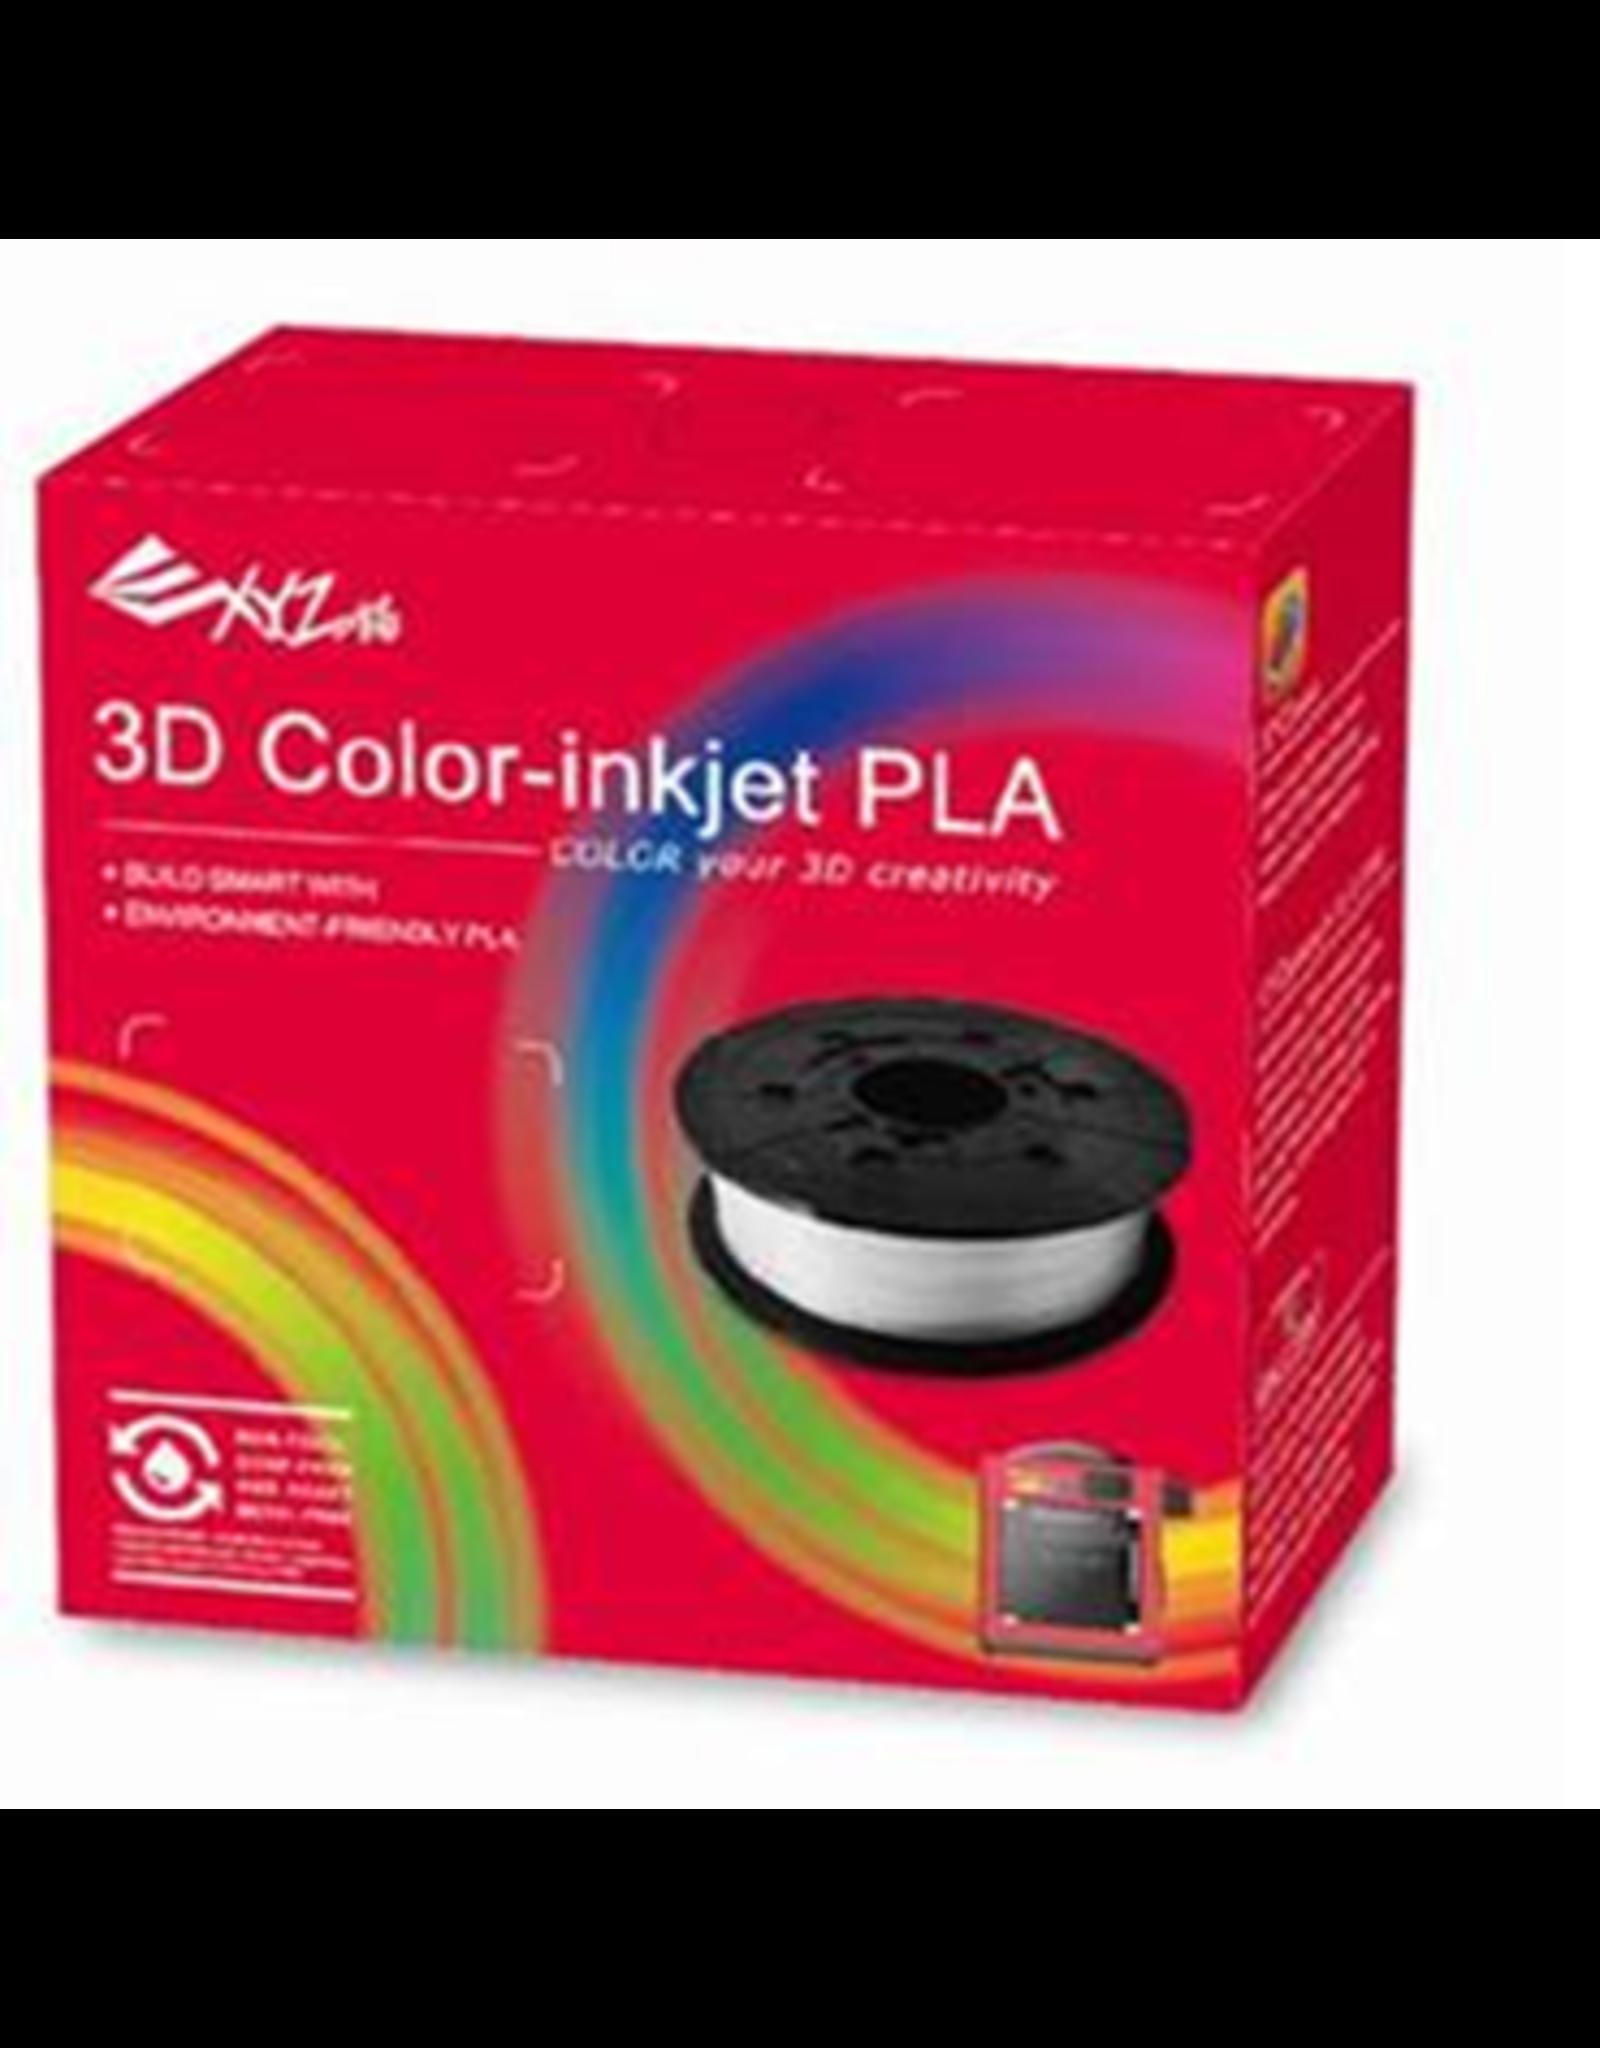 XYZ Printing Da Vinci XYZprinting CPLA - 600g - White for da Vinci Color